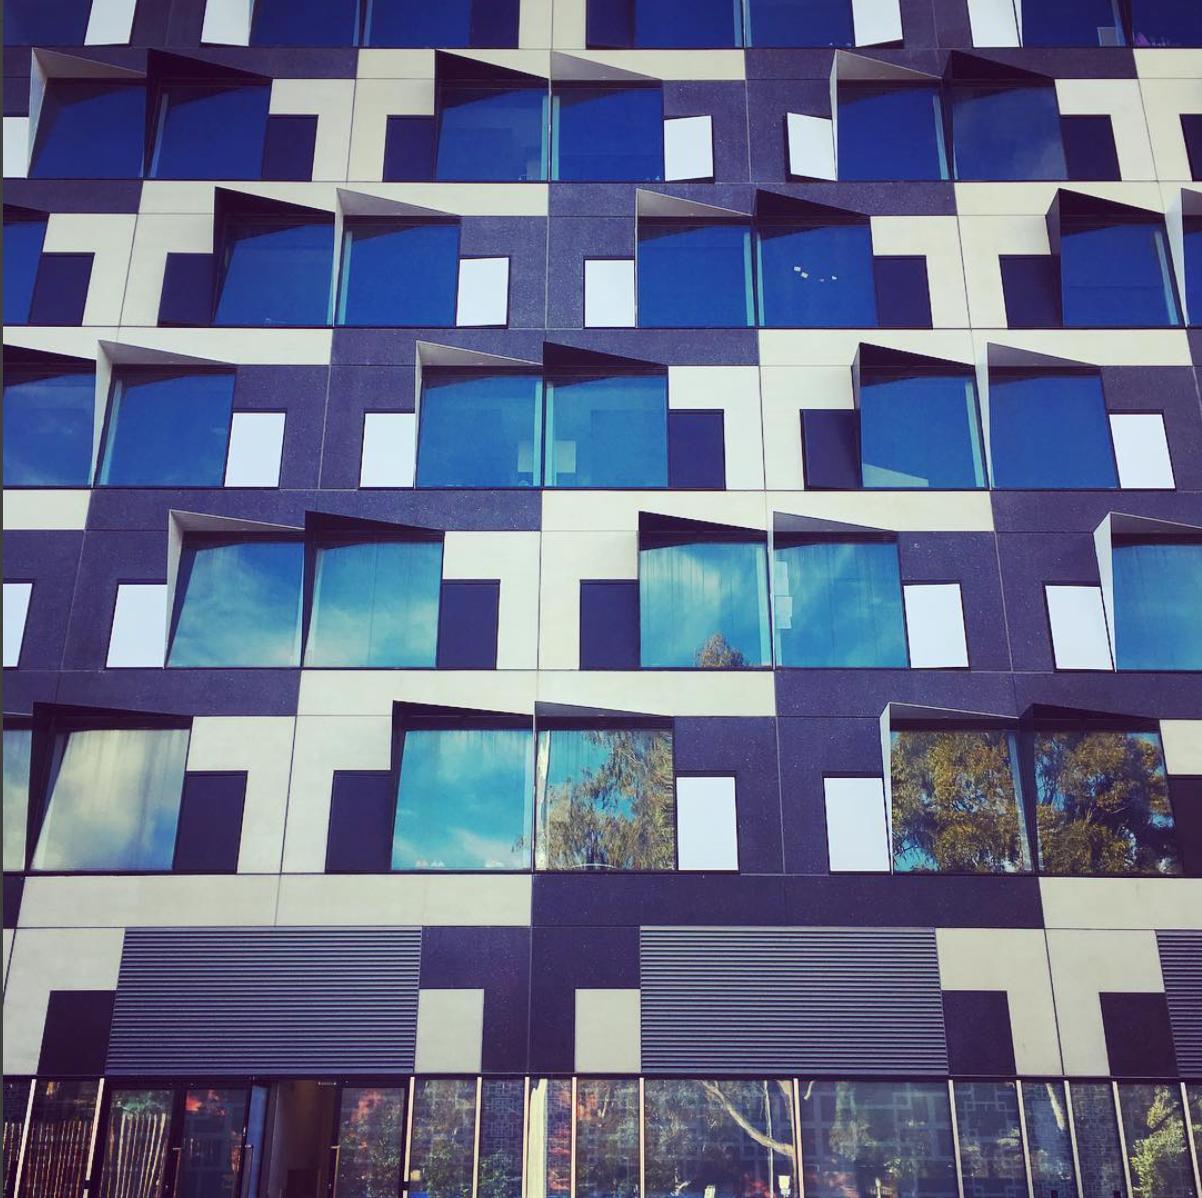 Beautifully Design Windows at Monash Clayton